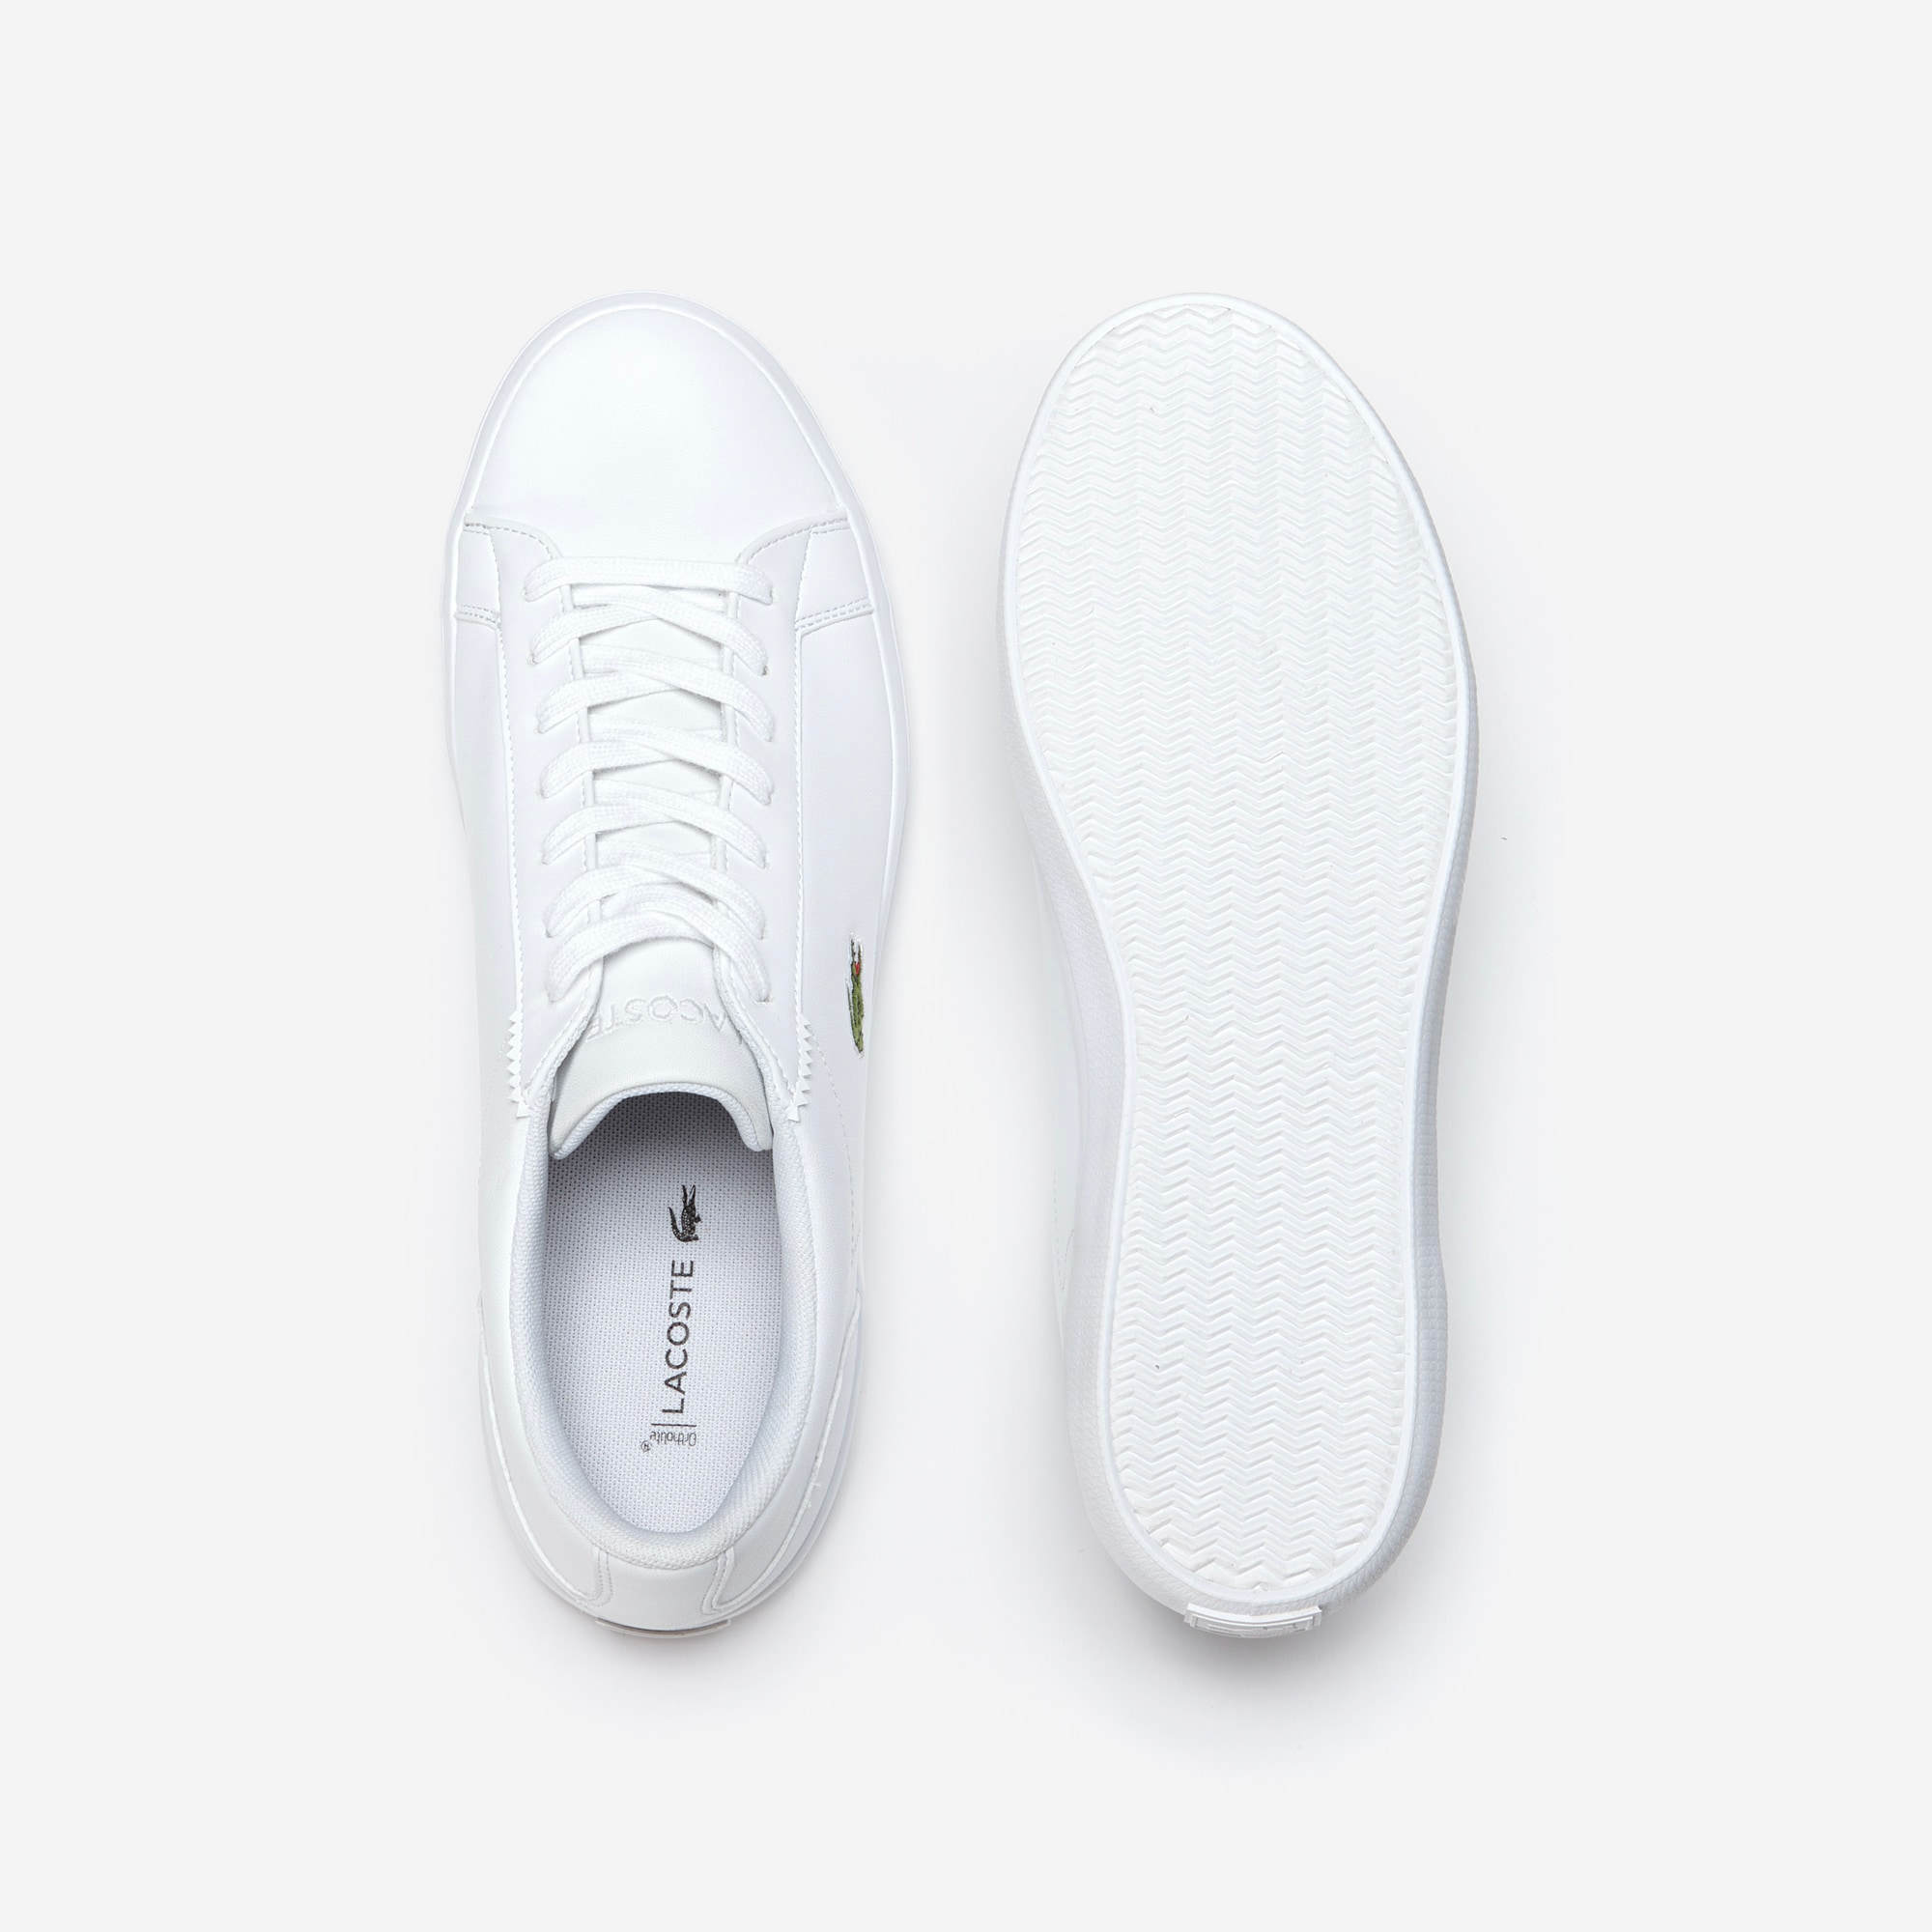 Lacoste - Herren-Sneakers LEROND aus einfarbigem Leder - 4